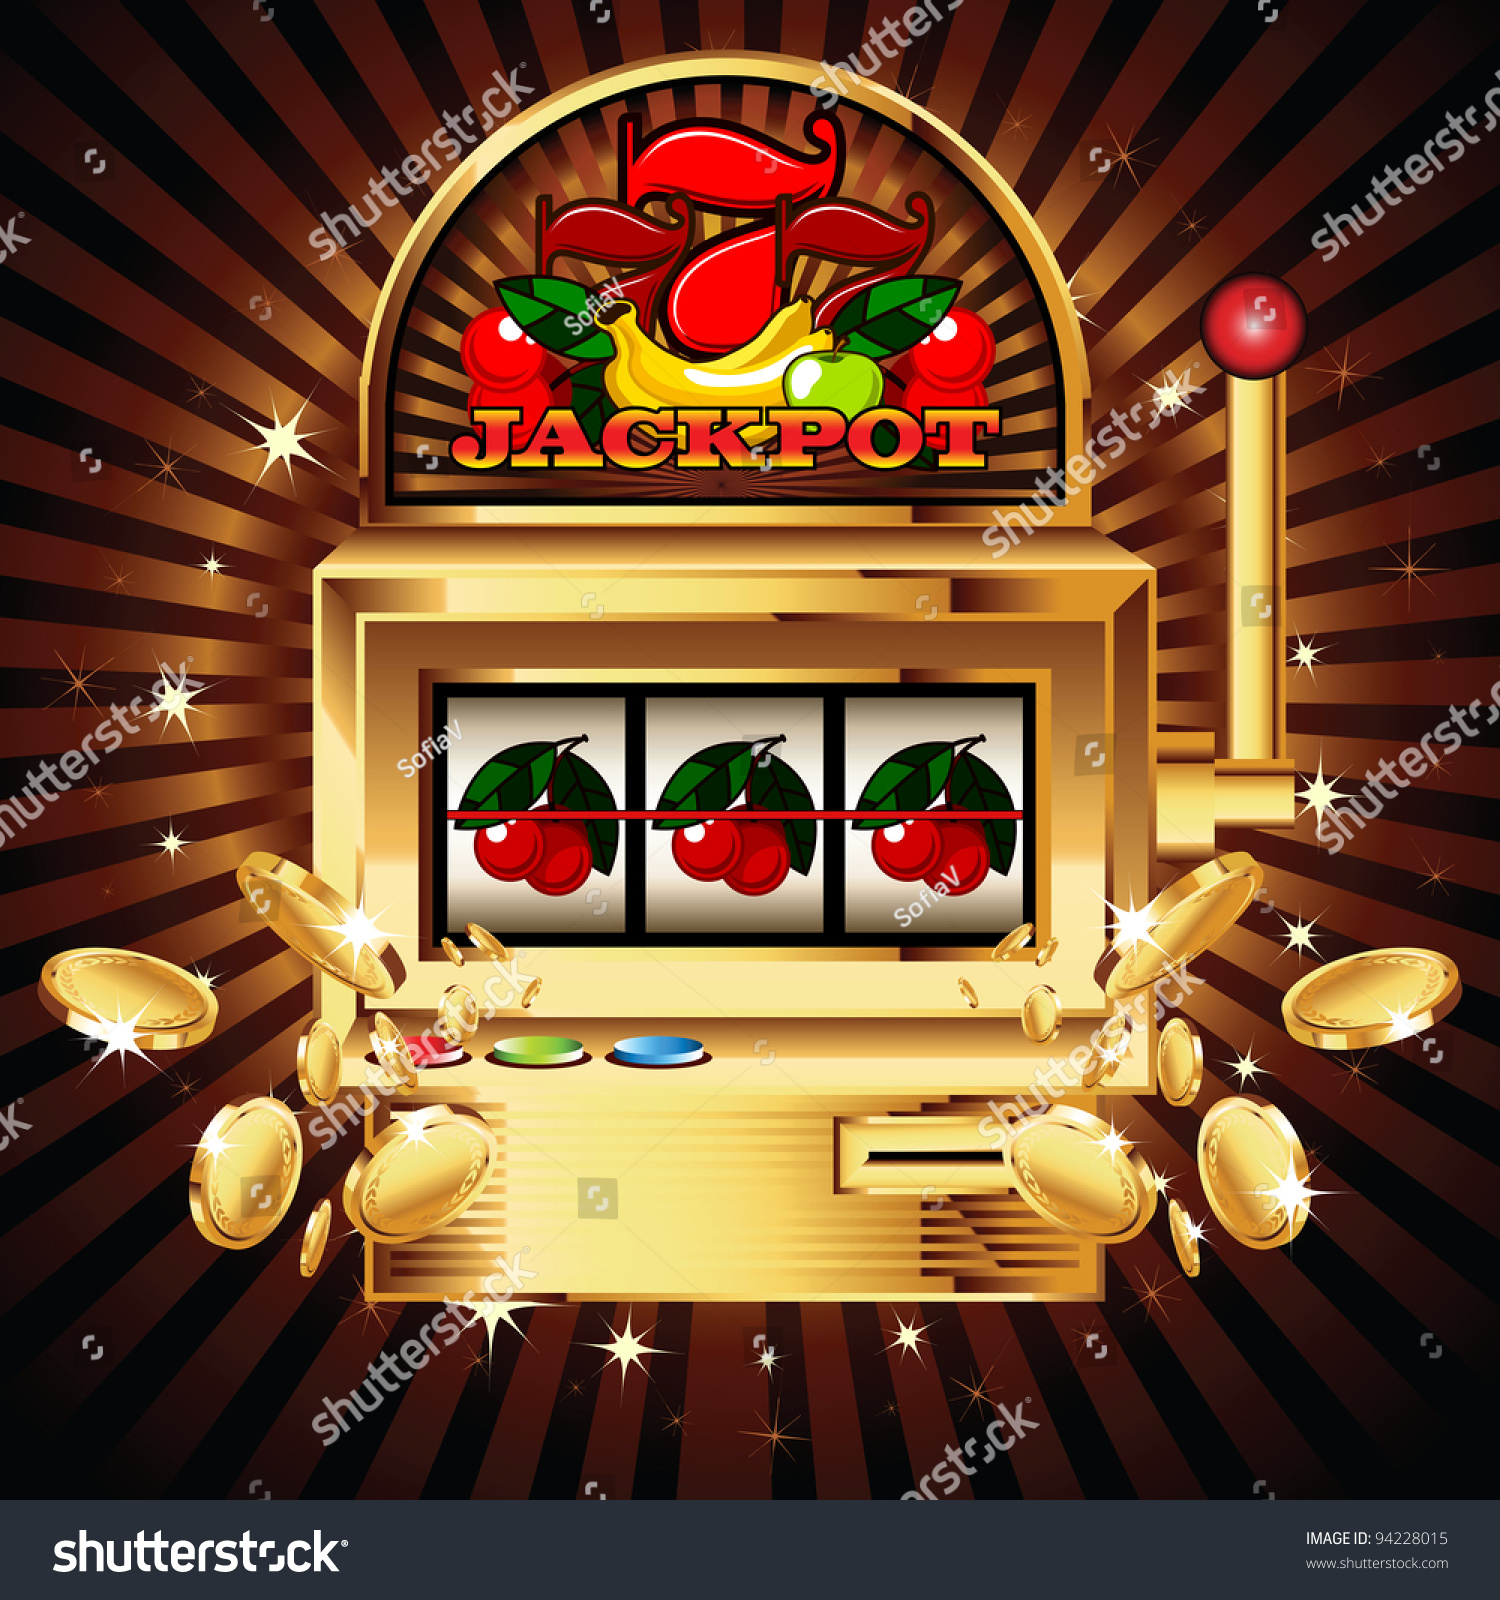 Golden cherry casino login